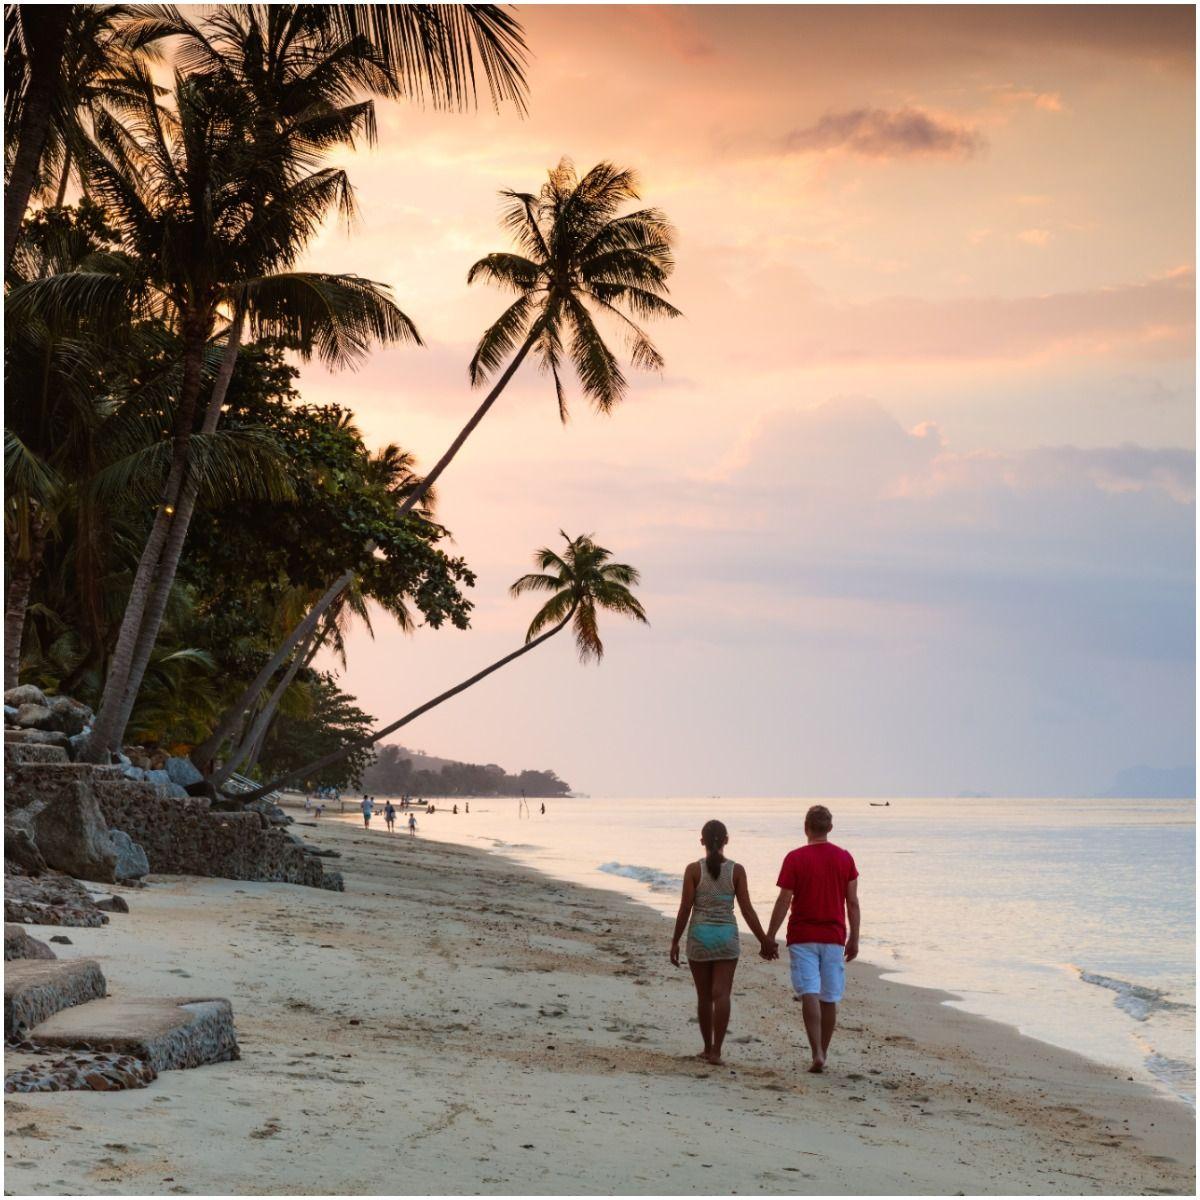 Go for a stroll at the beach